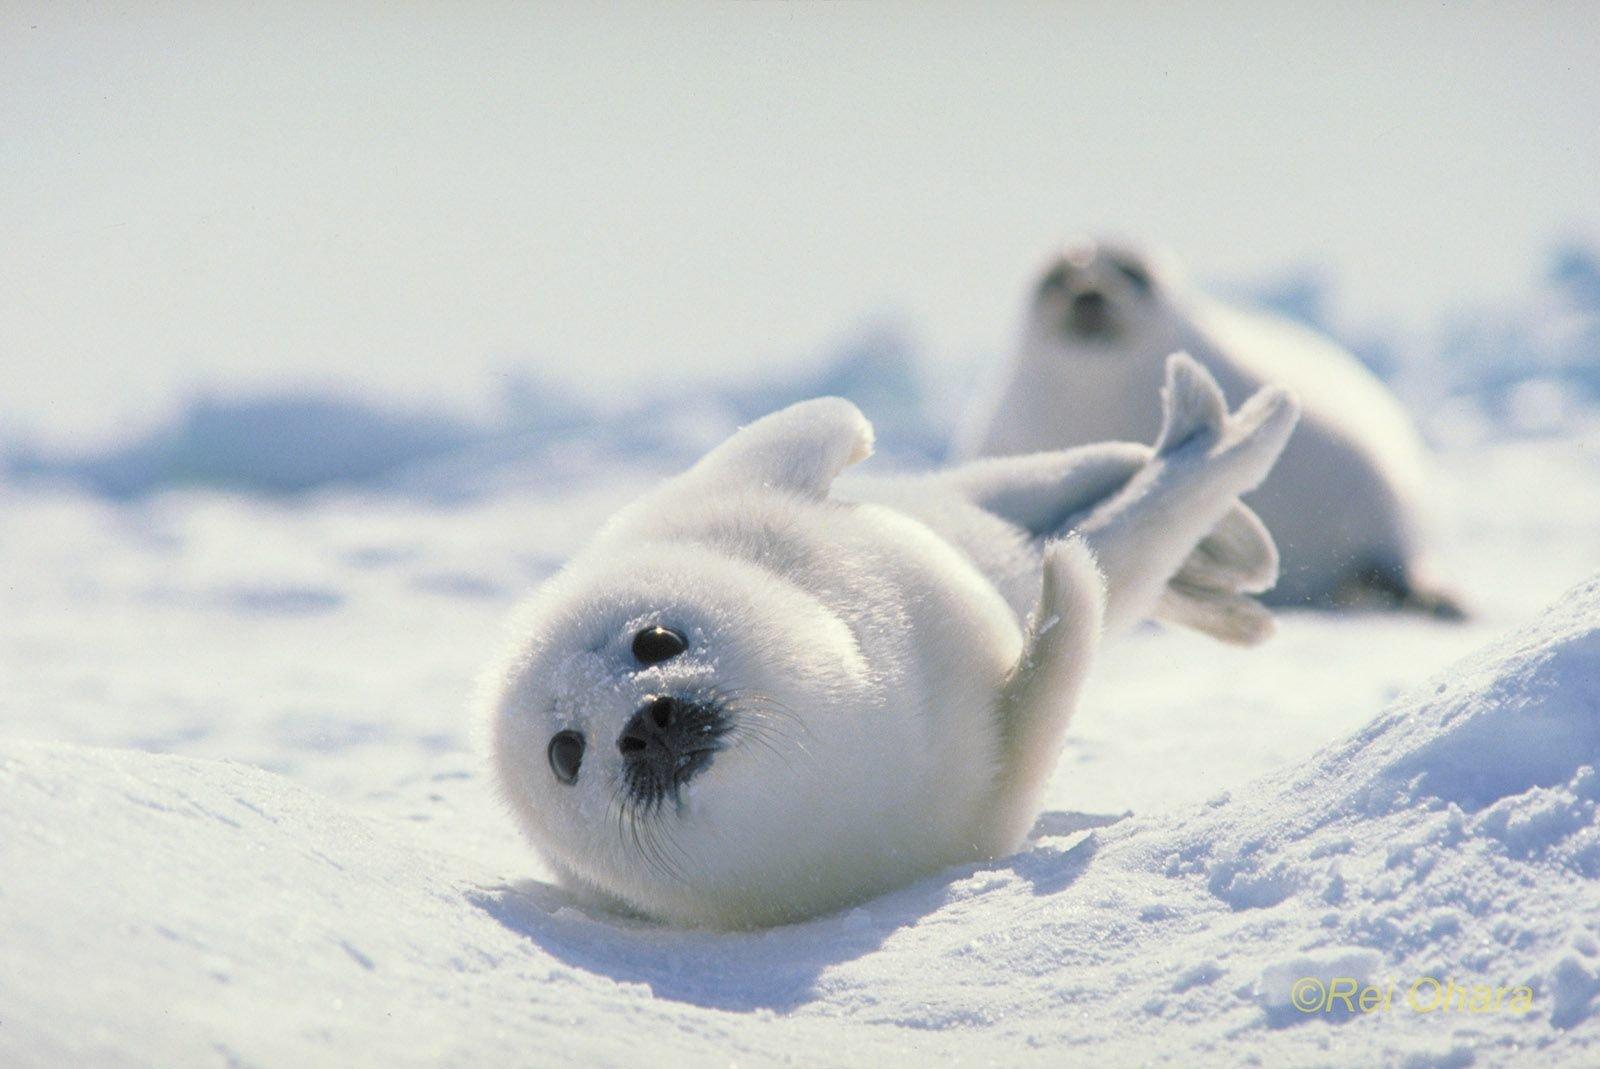 Cute Baby Seals 9361 Hd Wallpapers: Japan, Hokkaido Harp Seal Wallpaper And Background Image